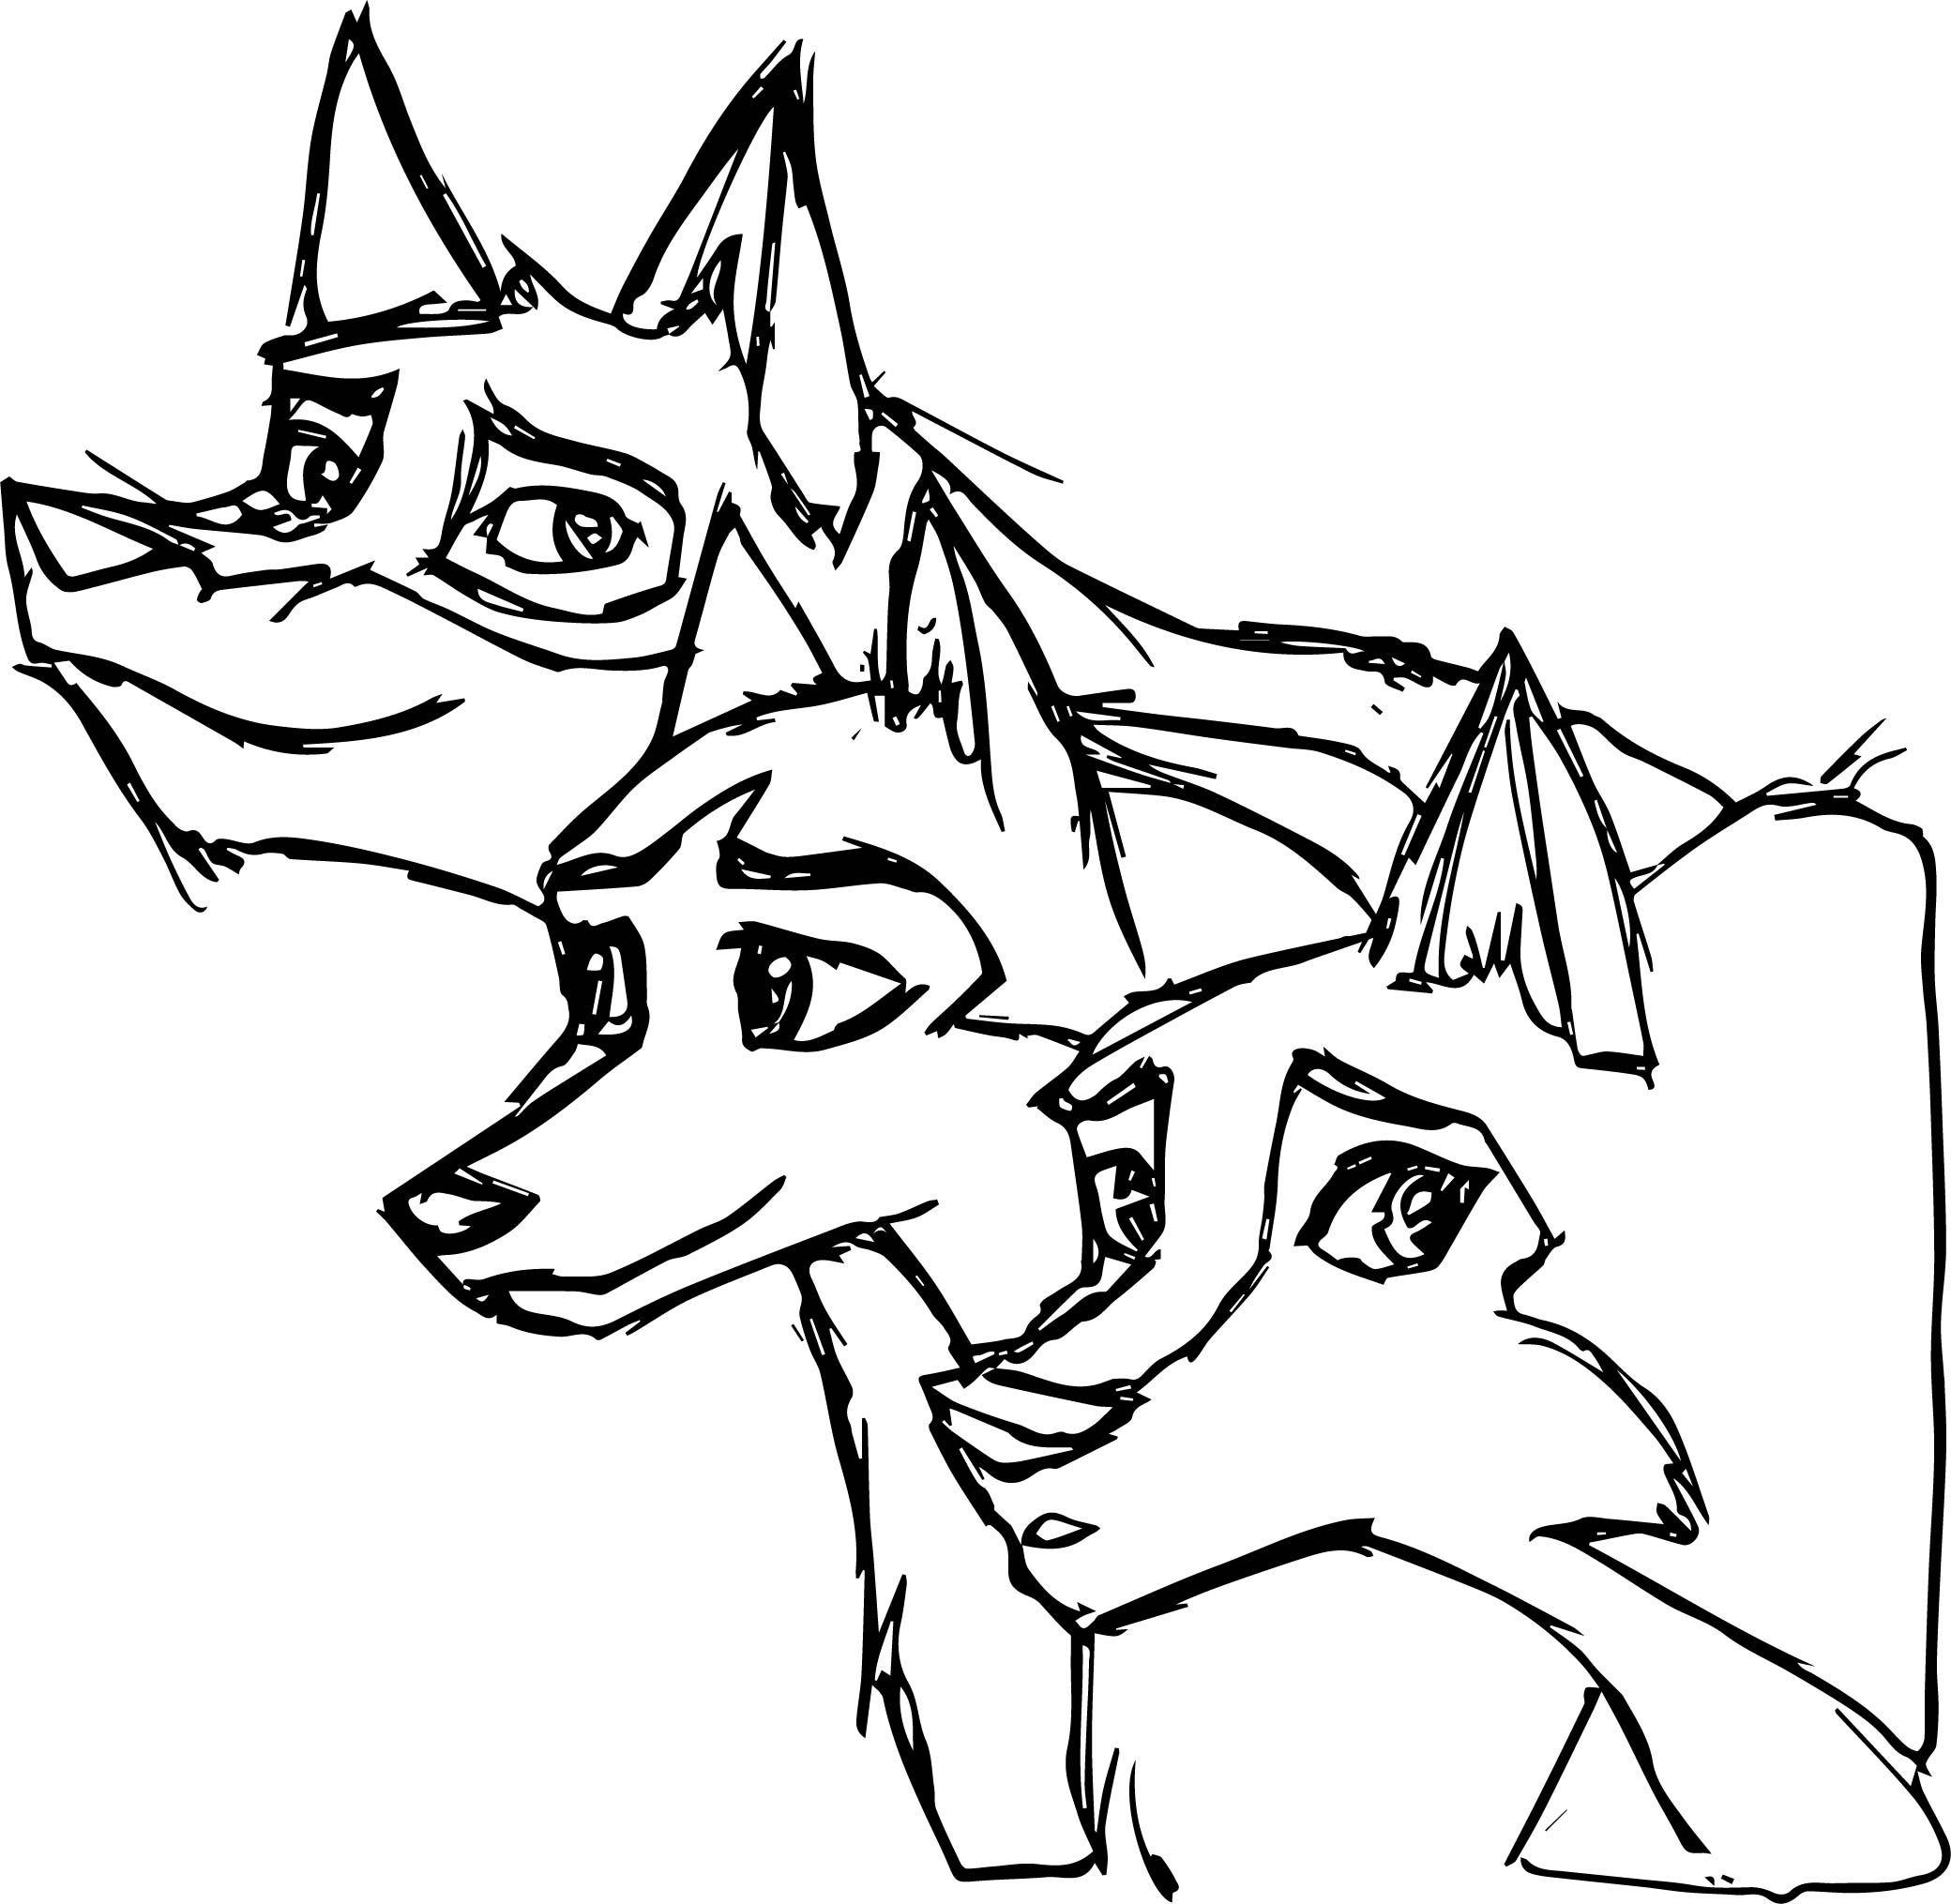 Pin By Nemora Hoff On Desenhos De Caes Dog Sketch Coloring Pages Anime [ 2030 x 2080 Pixel ]